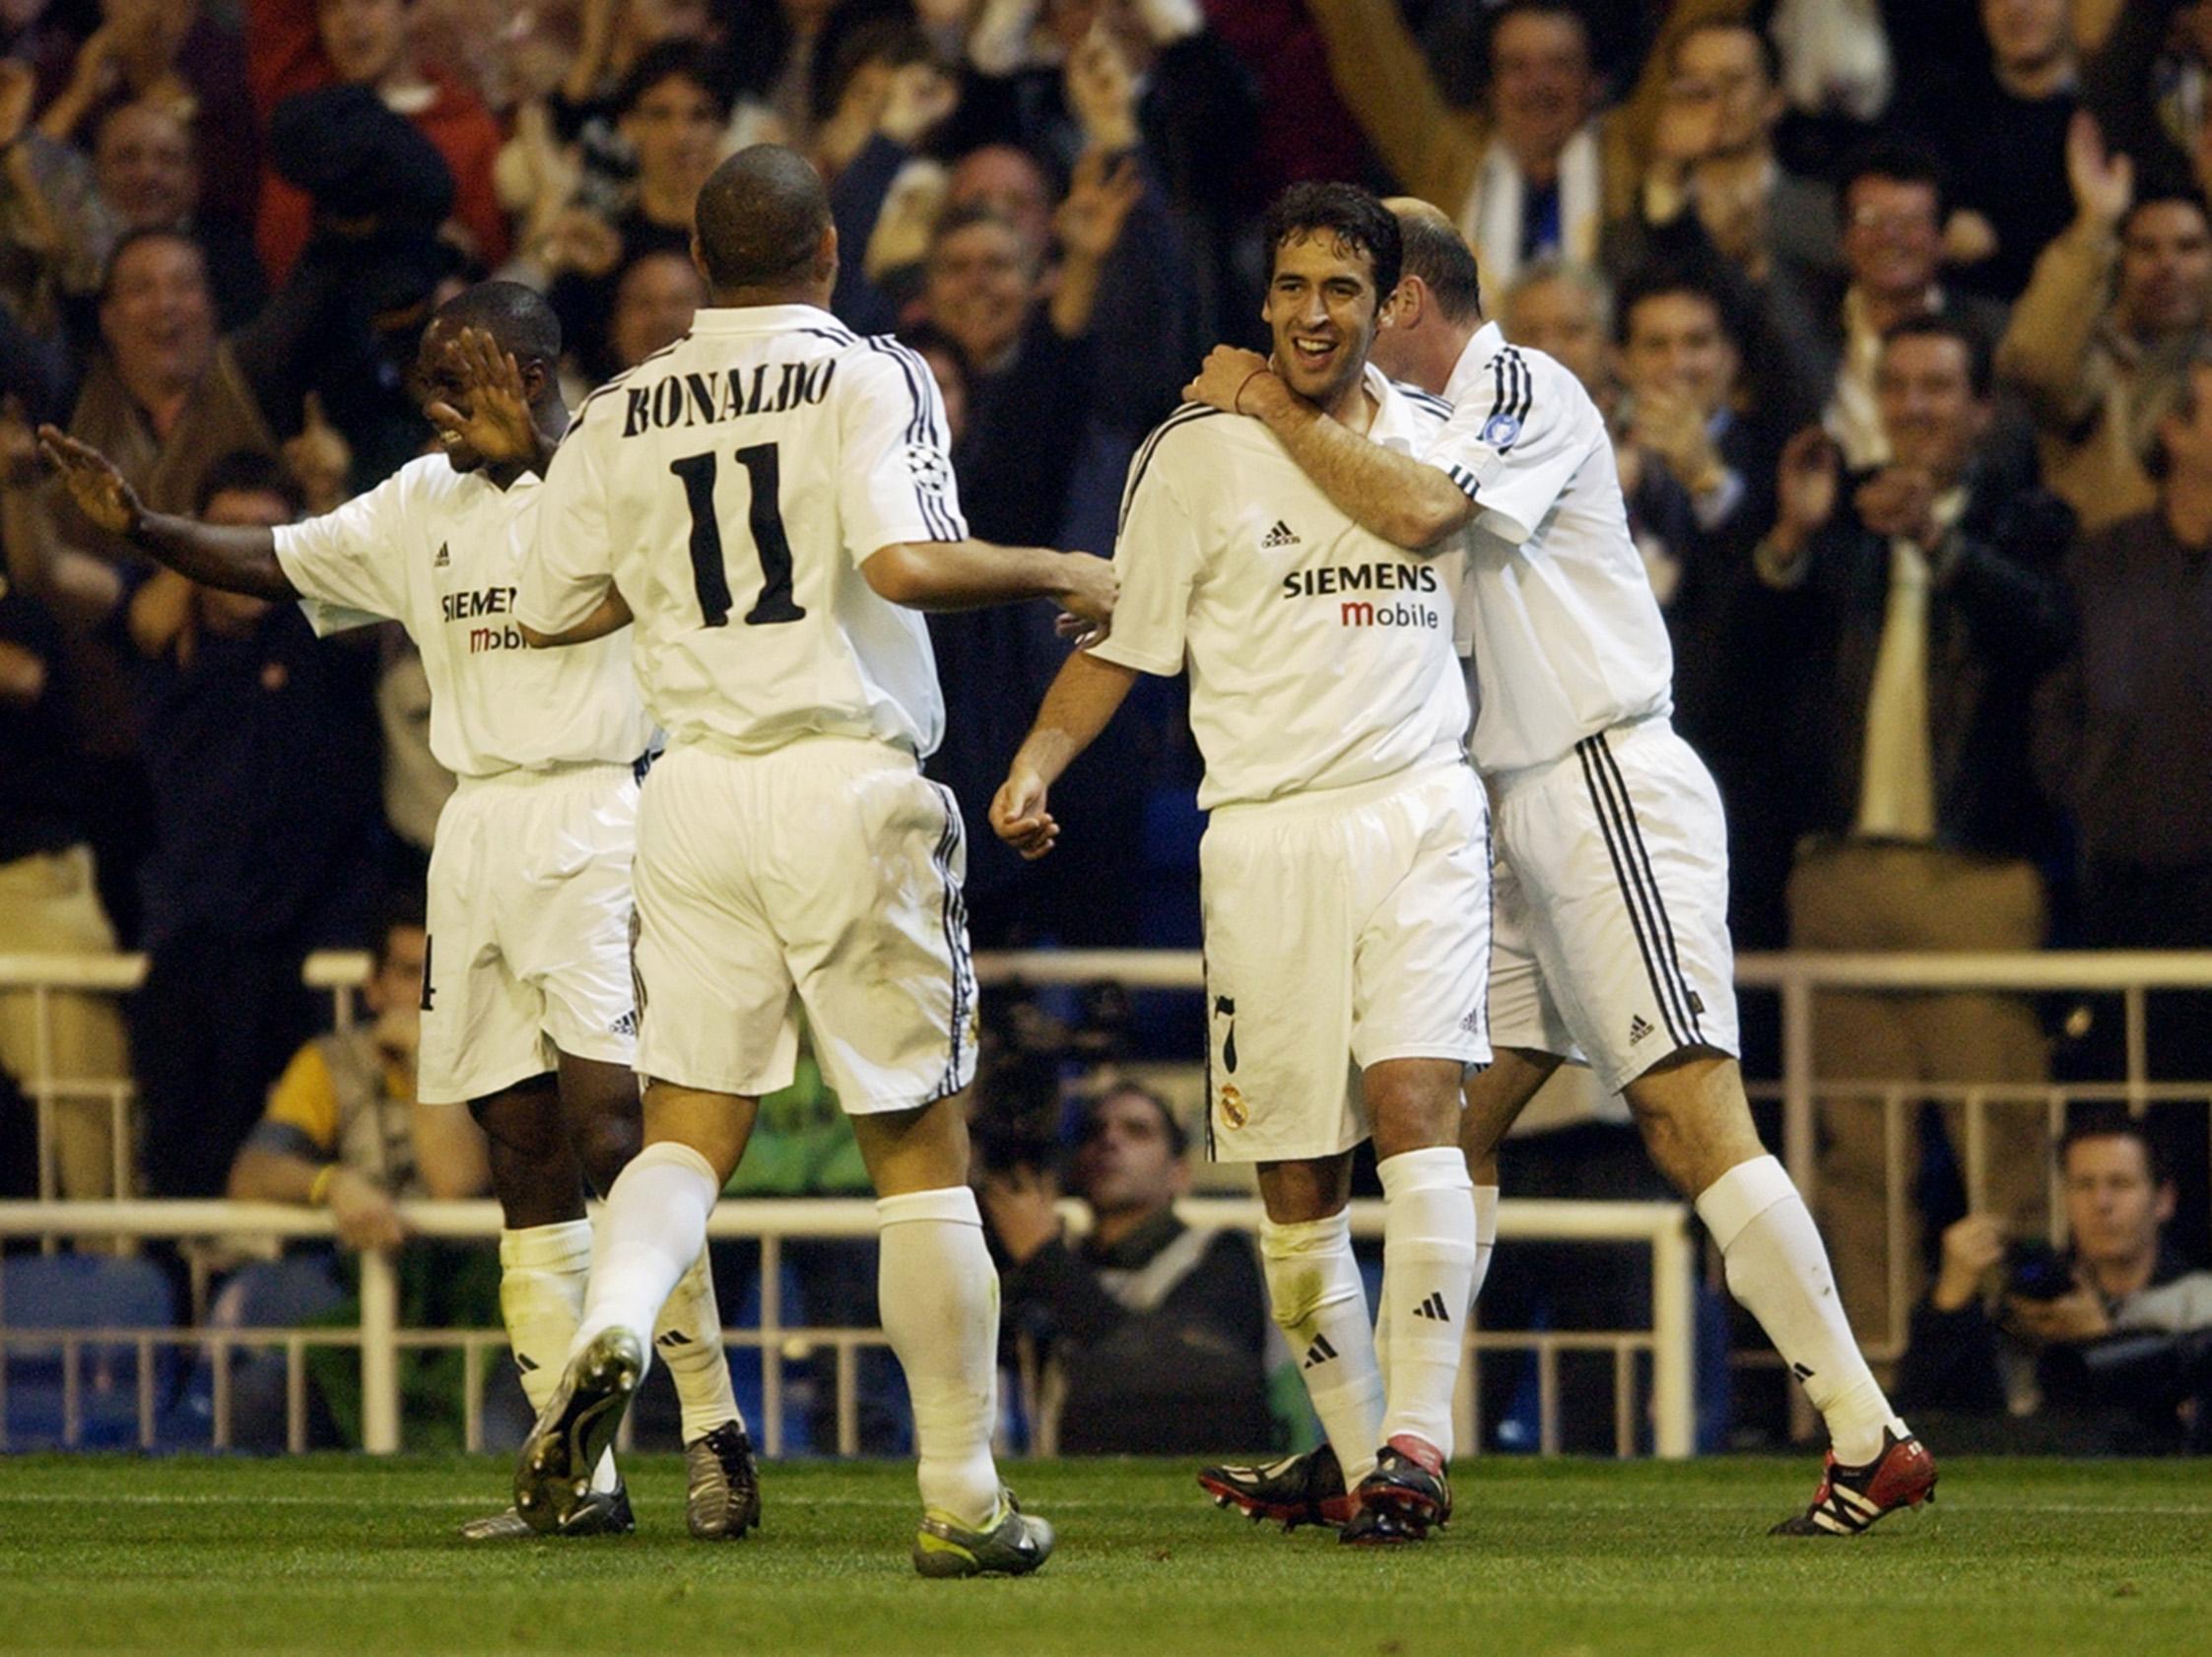 ee4ddcbc1 Walking Through The Real Madrid Vault - Managing Madrid